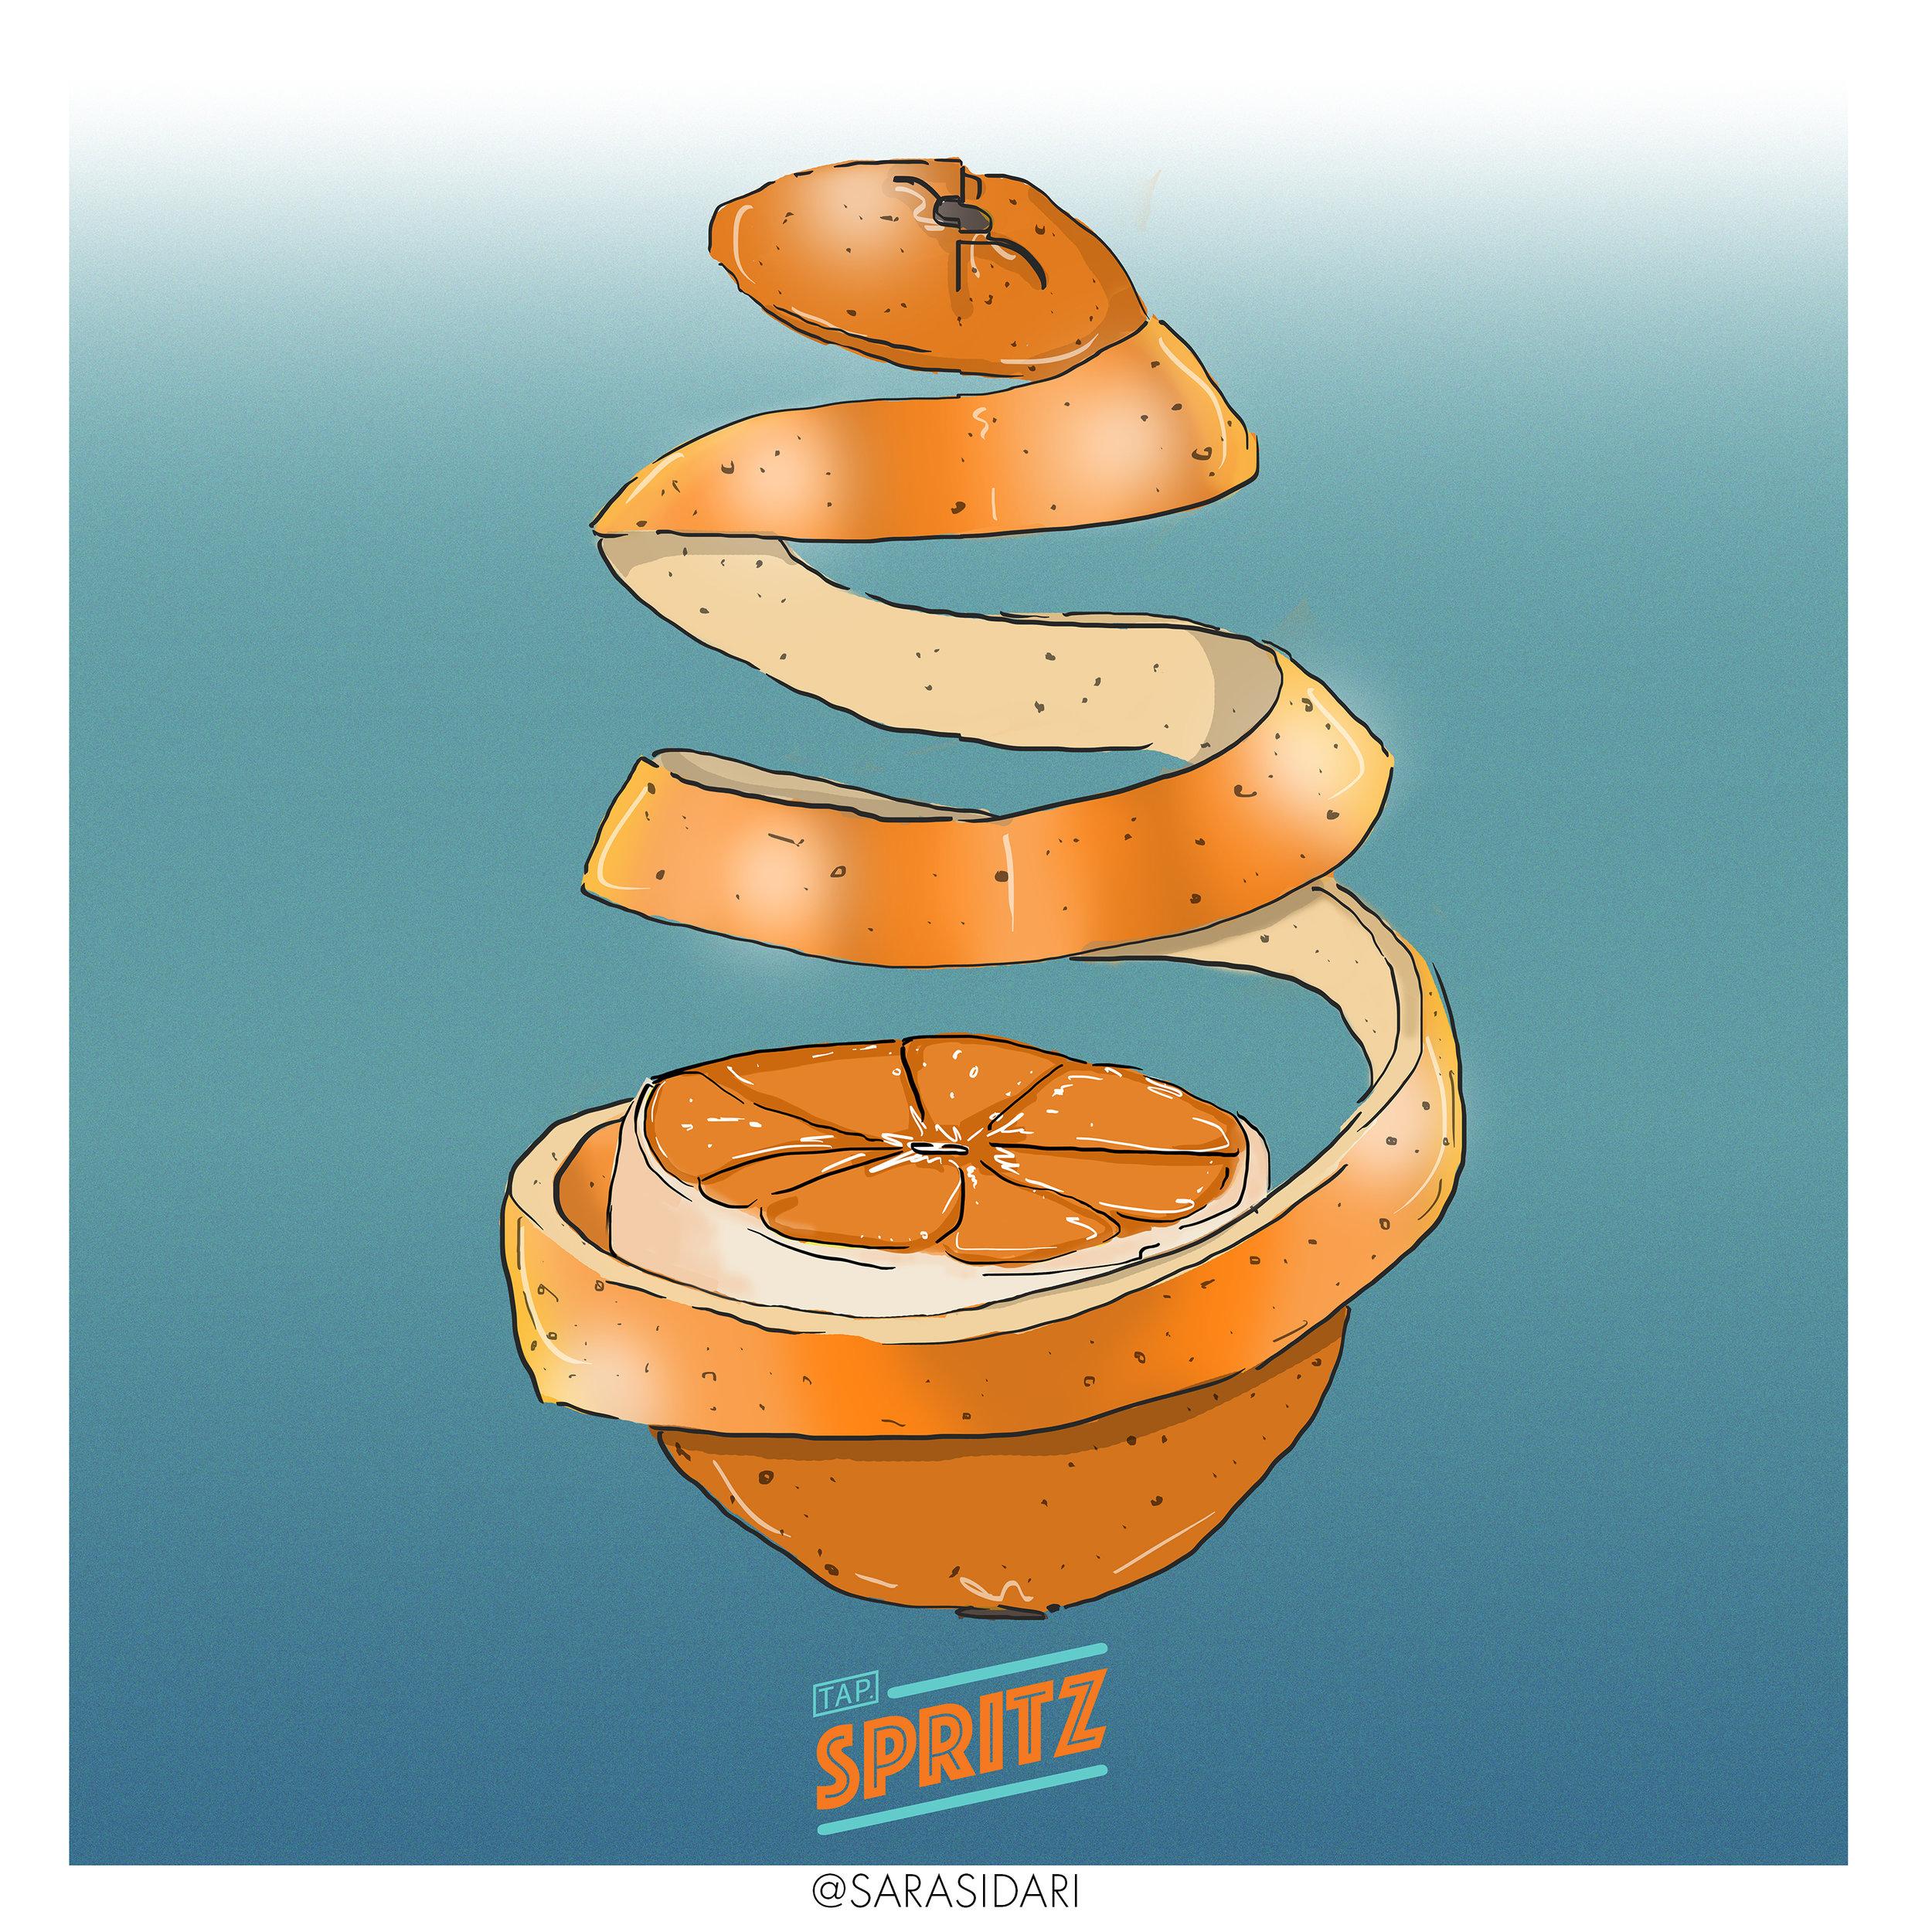 spritz tap branding illustrations.jpg